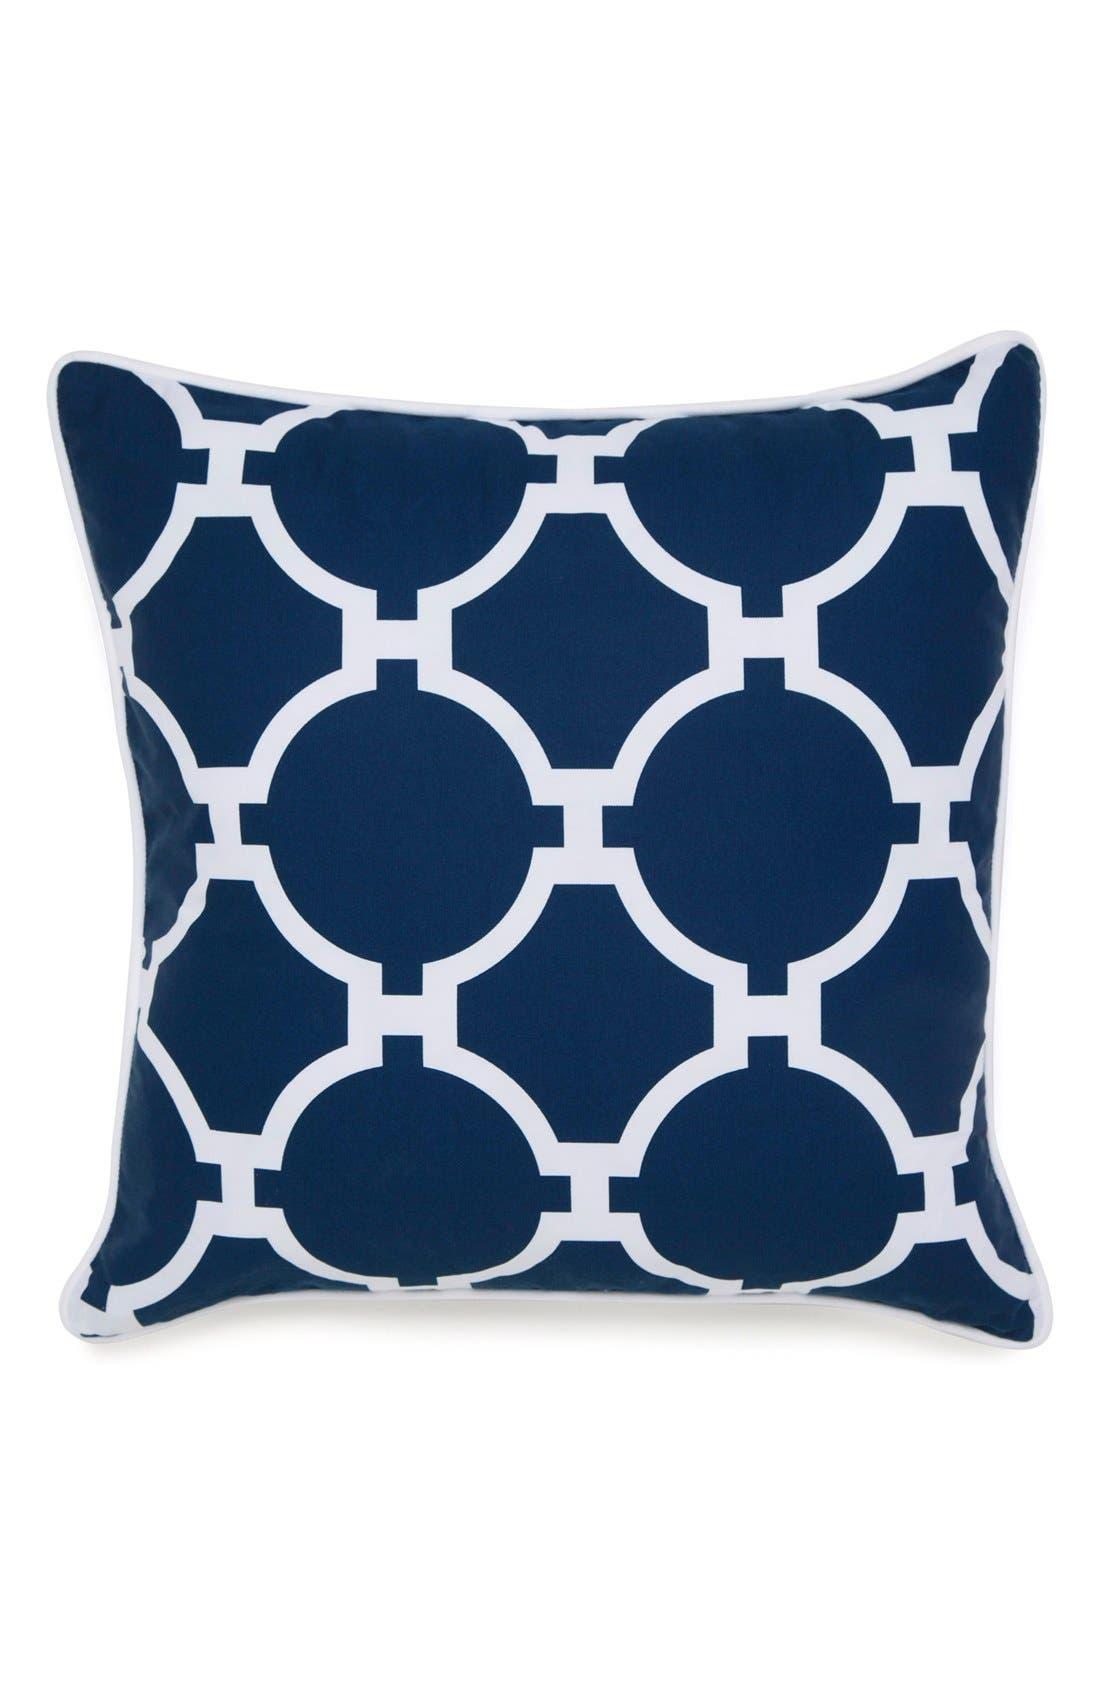 Alternate Image 1 Selected - Jill Rosenwald 'Copley Hampton Links' Pillow